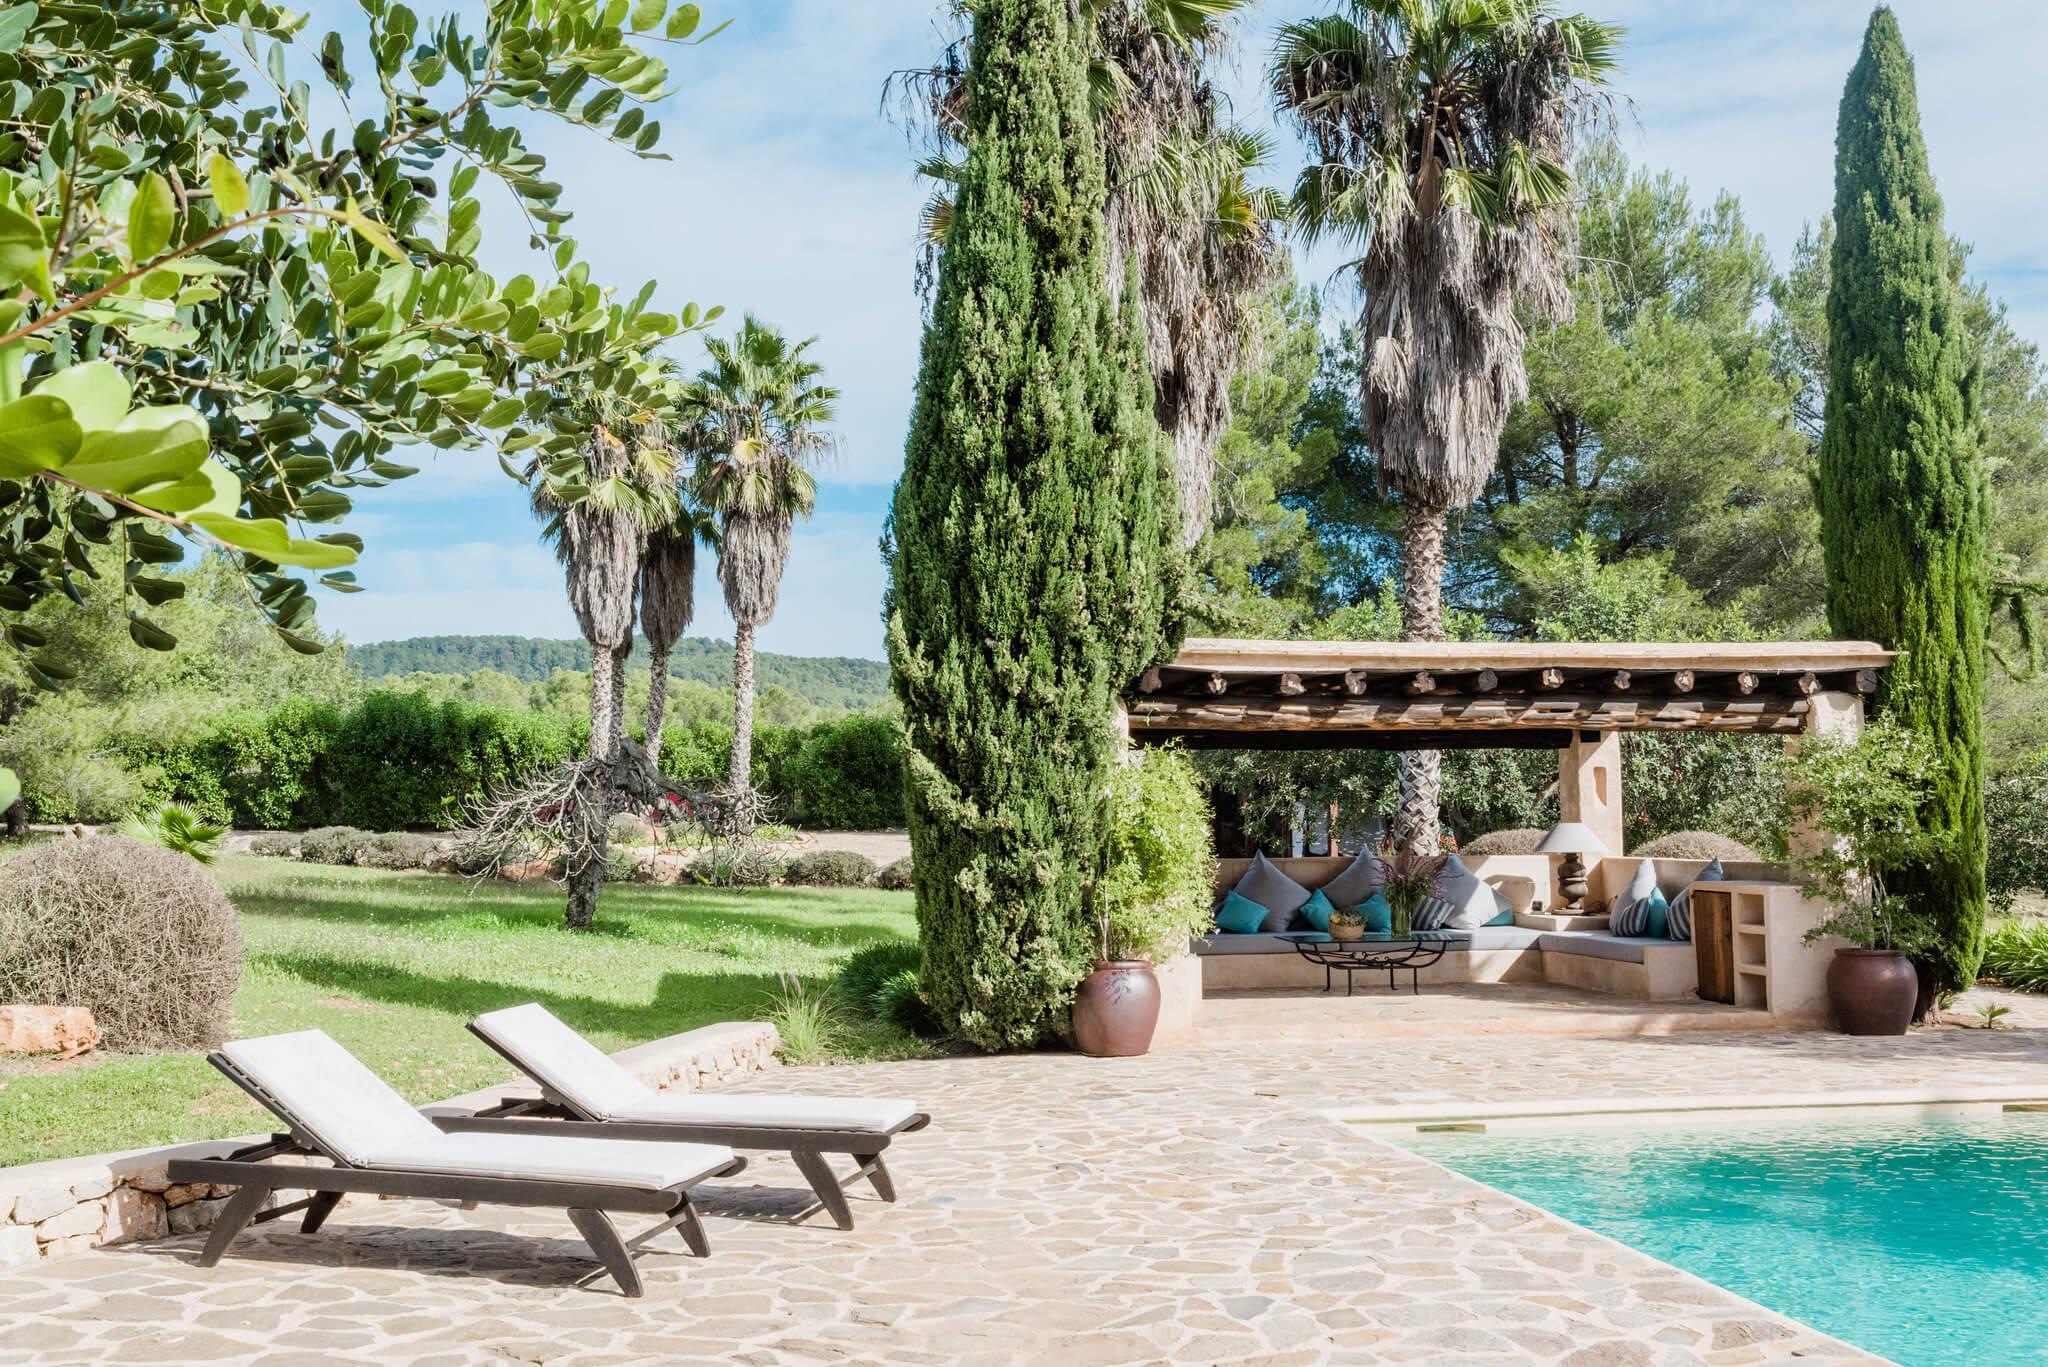 https://www.white-ibiza.com/wp-content/uploads/2020/05/white-ibiza-villas-can-sabina-exterior-pool-scene.jpg